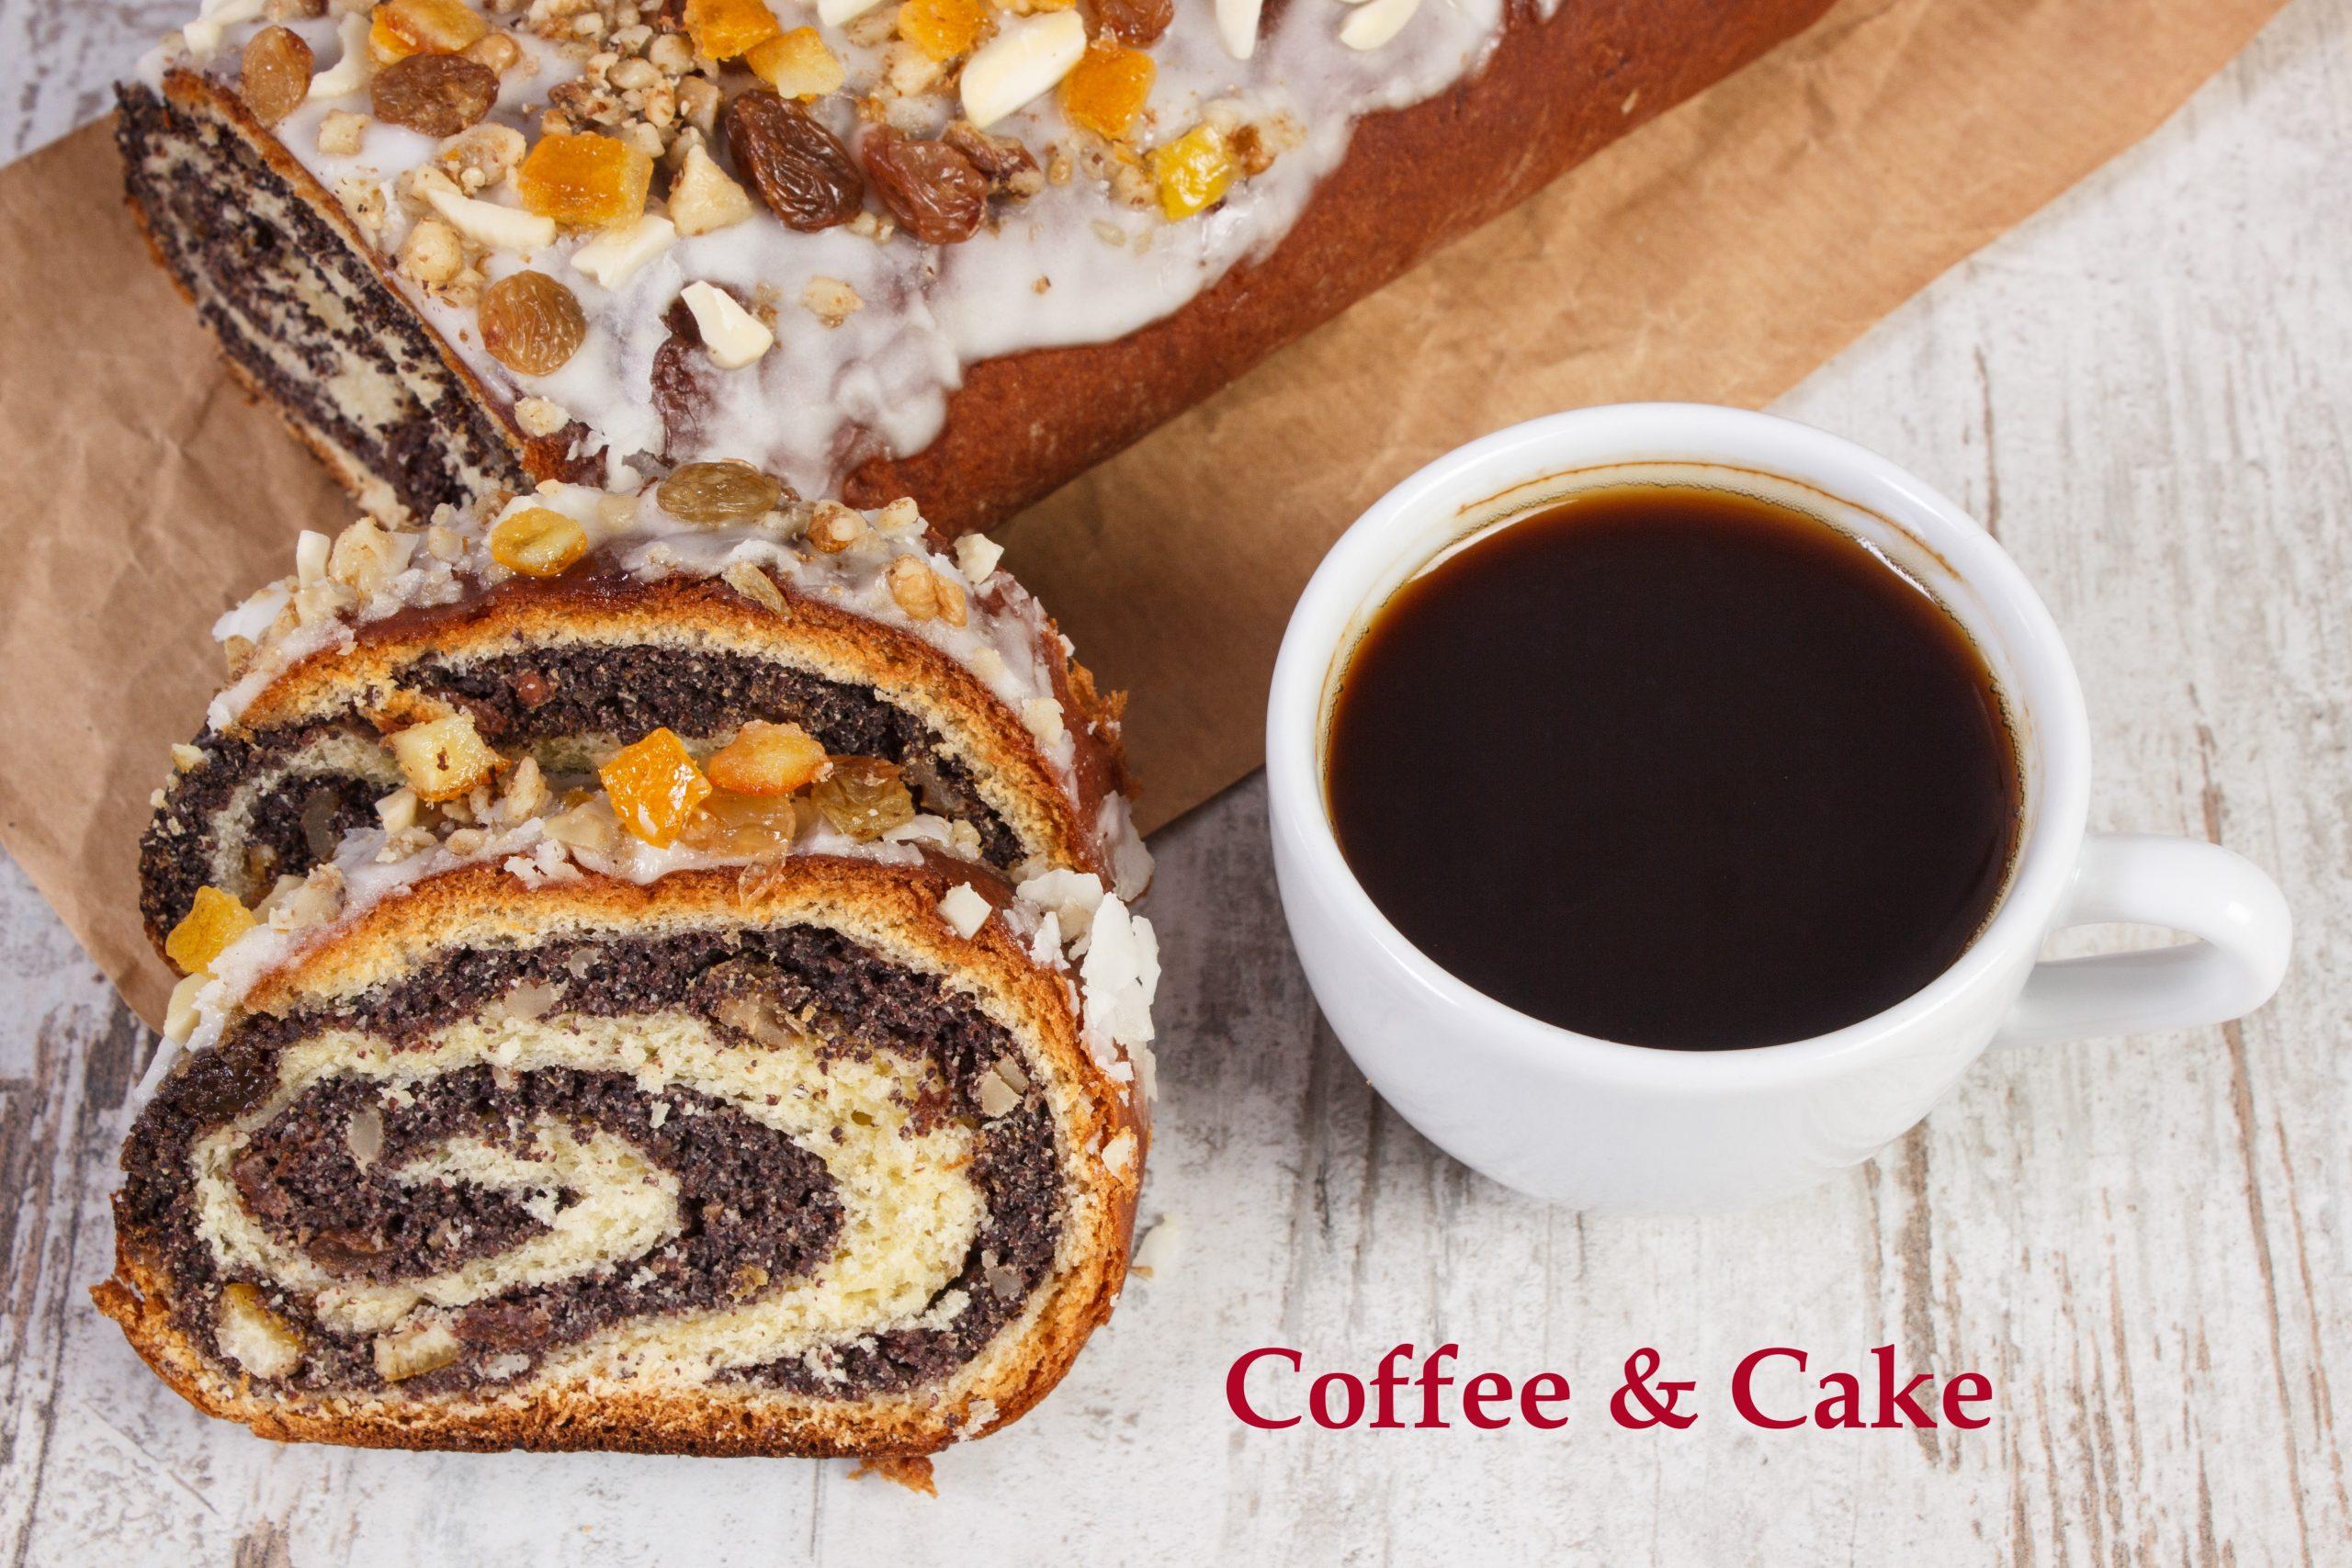 ALVN - Coffee & Cake III - Featured Image